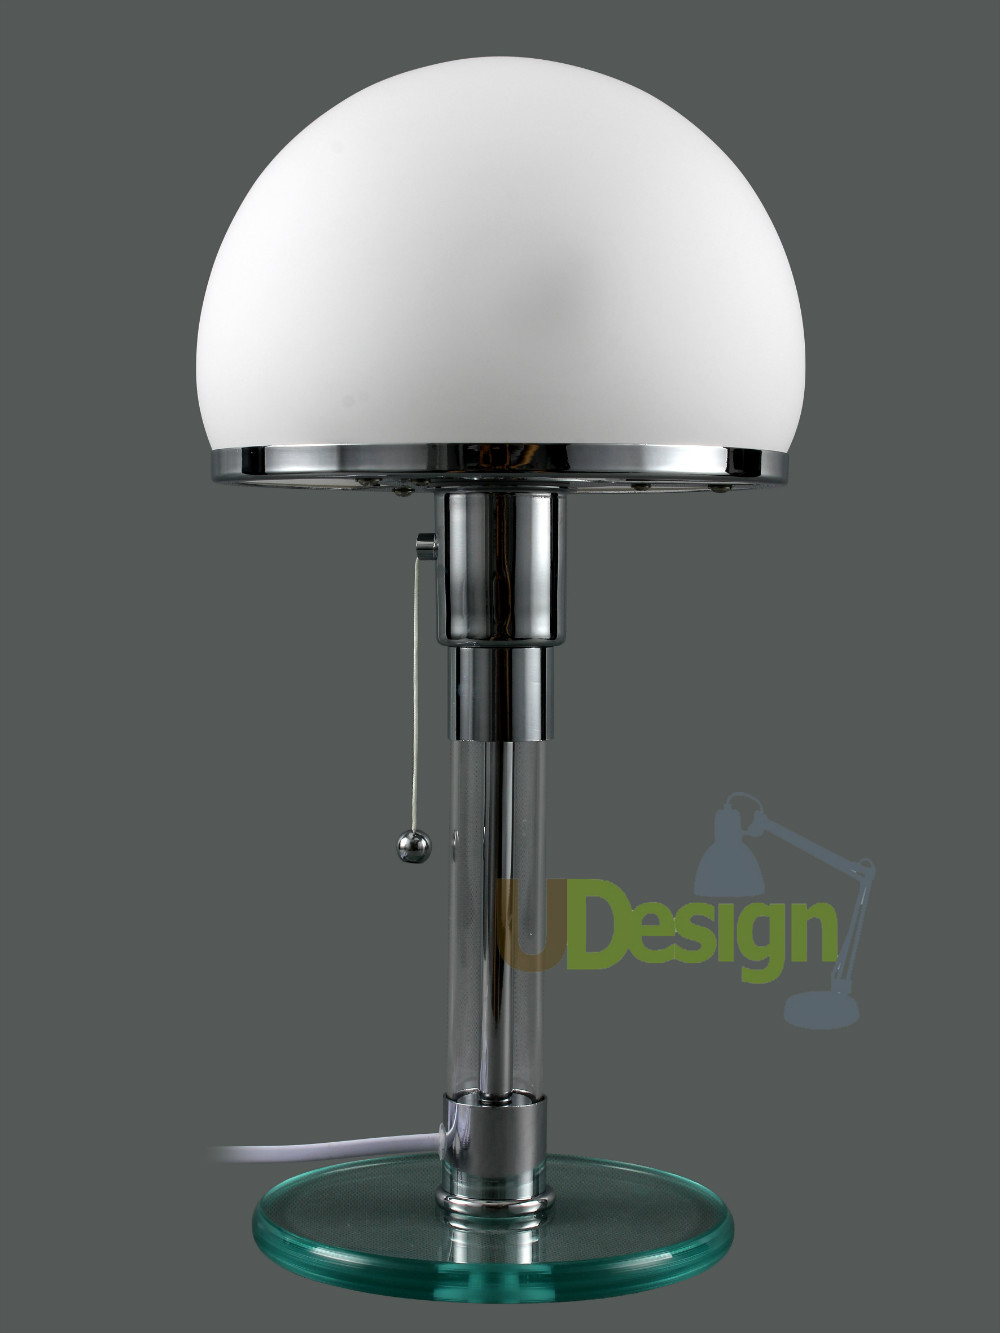 US $145.0 |Replika lampy Bauhaus Wilhelm Wagenfeld lampa stołowa lampa Bauhaus|table lamp|bauhaus lampbauhaus lamp wilhelm wagenfeld AliExpress